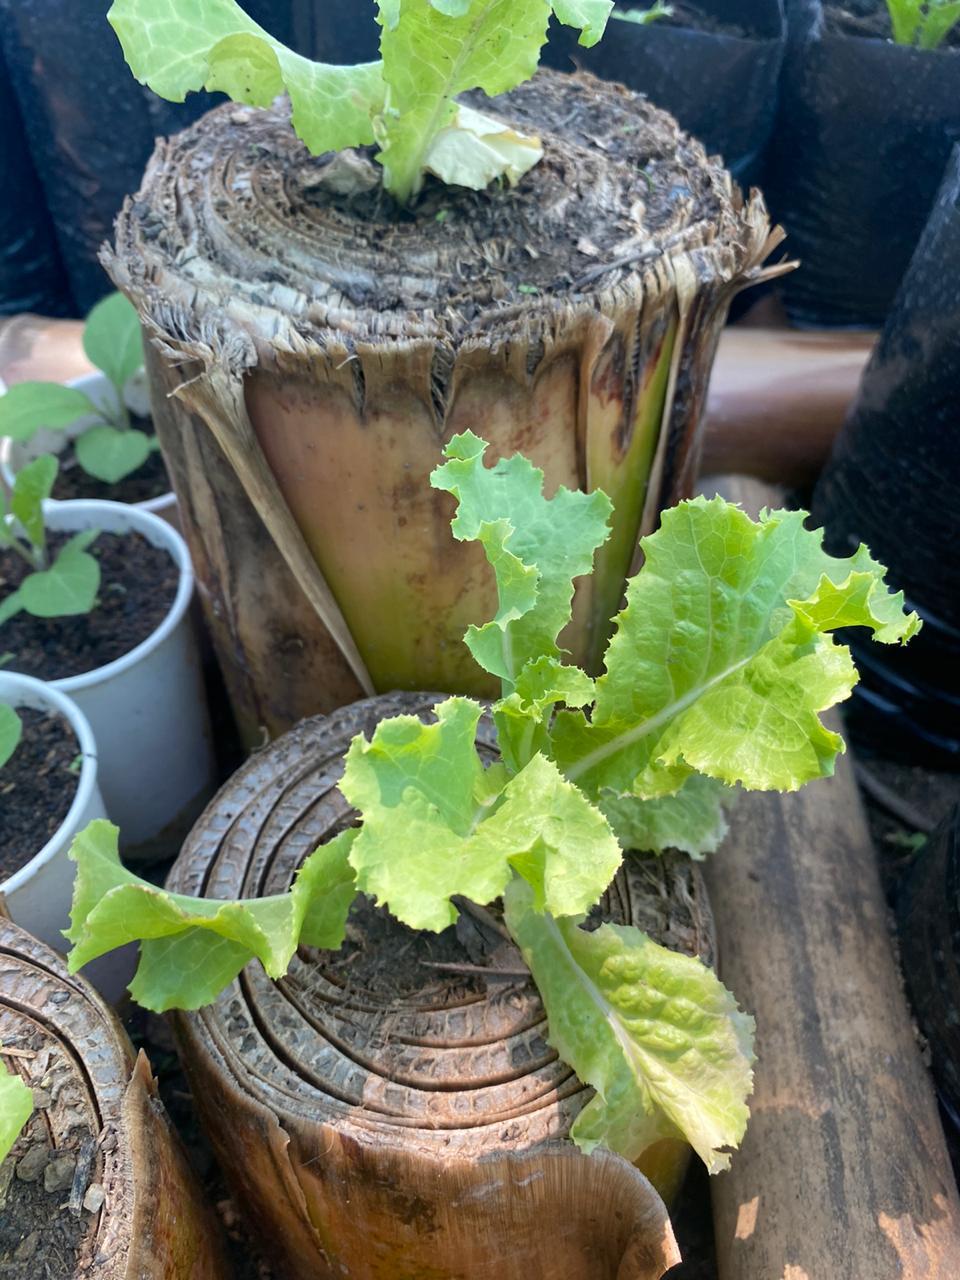 Lettuce grow in banana trunk